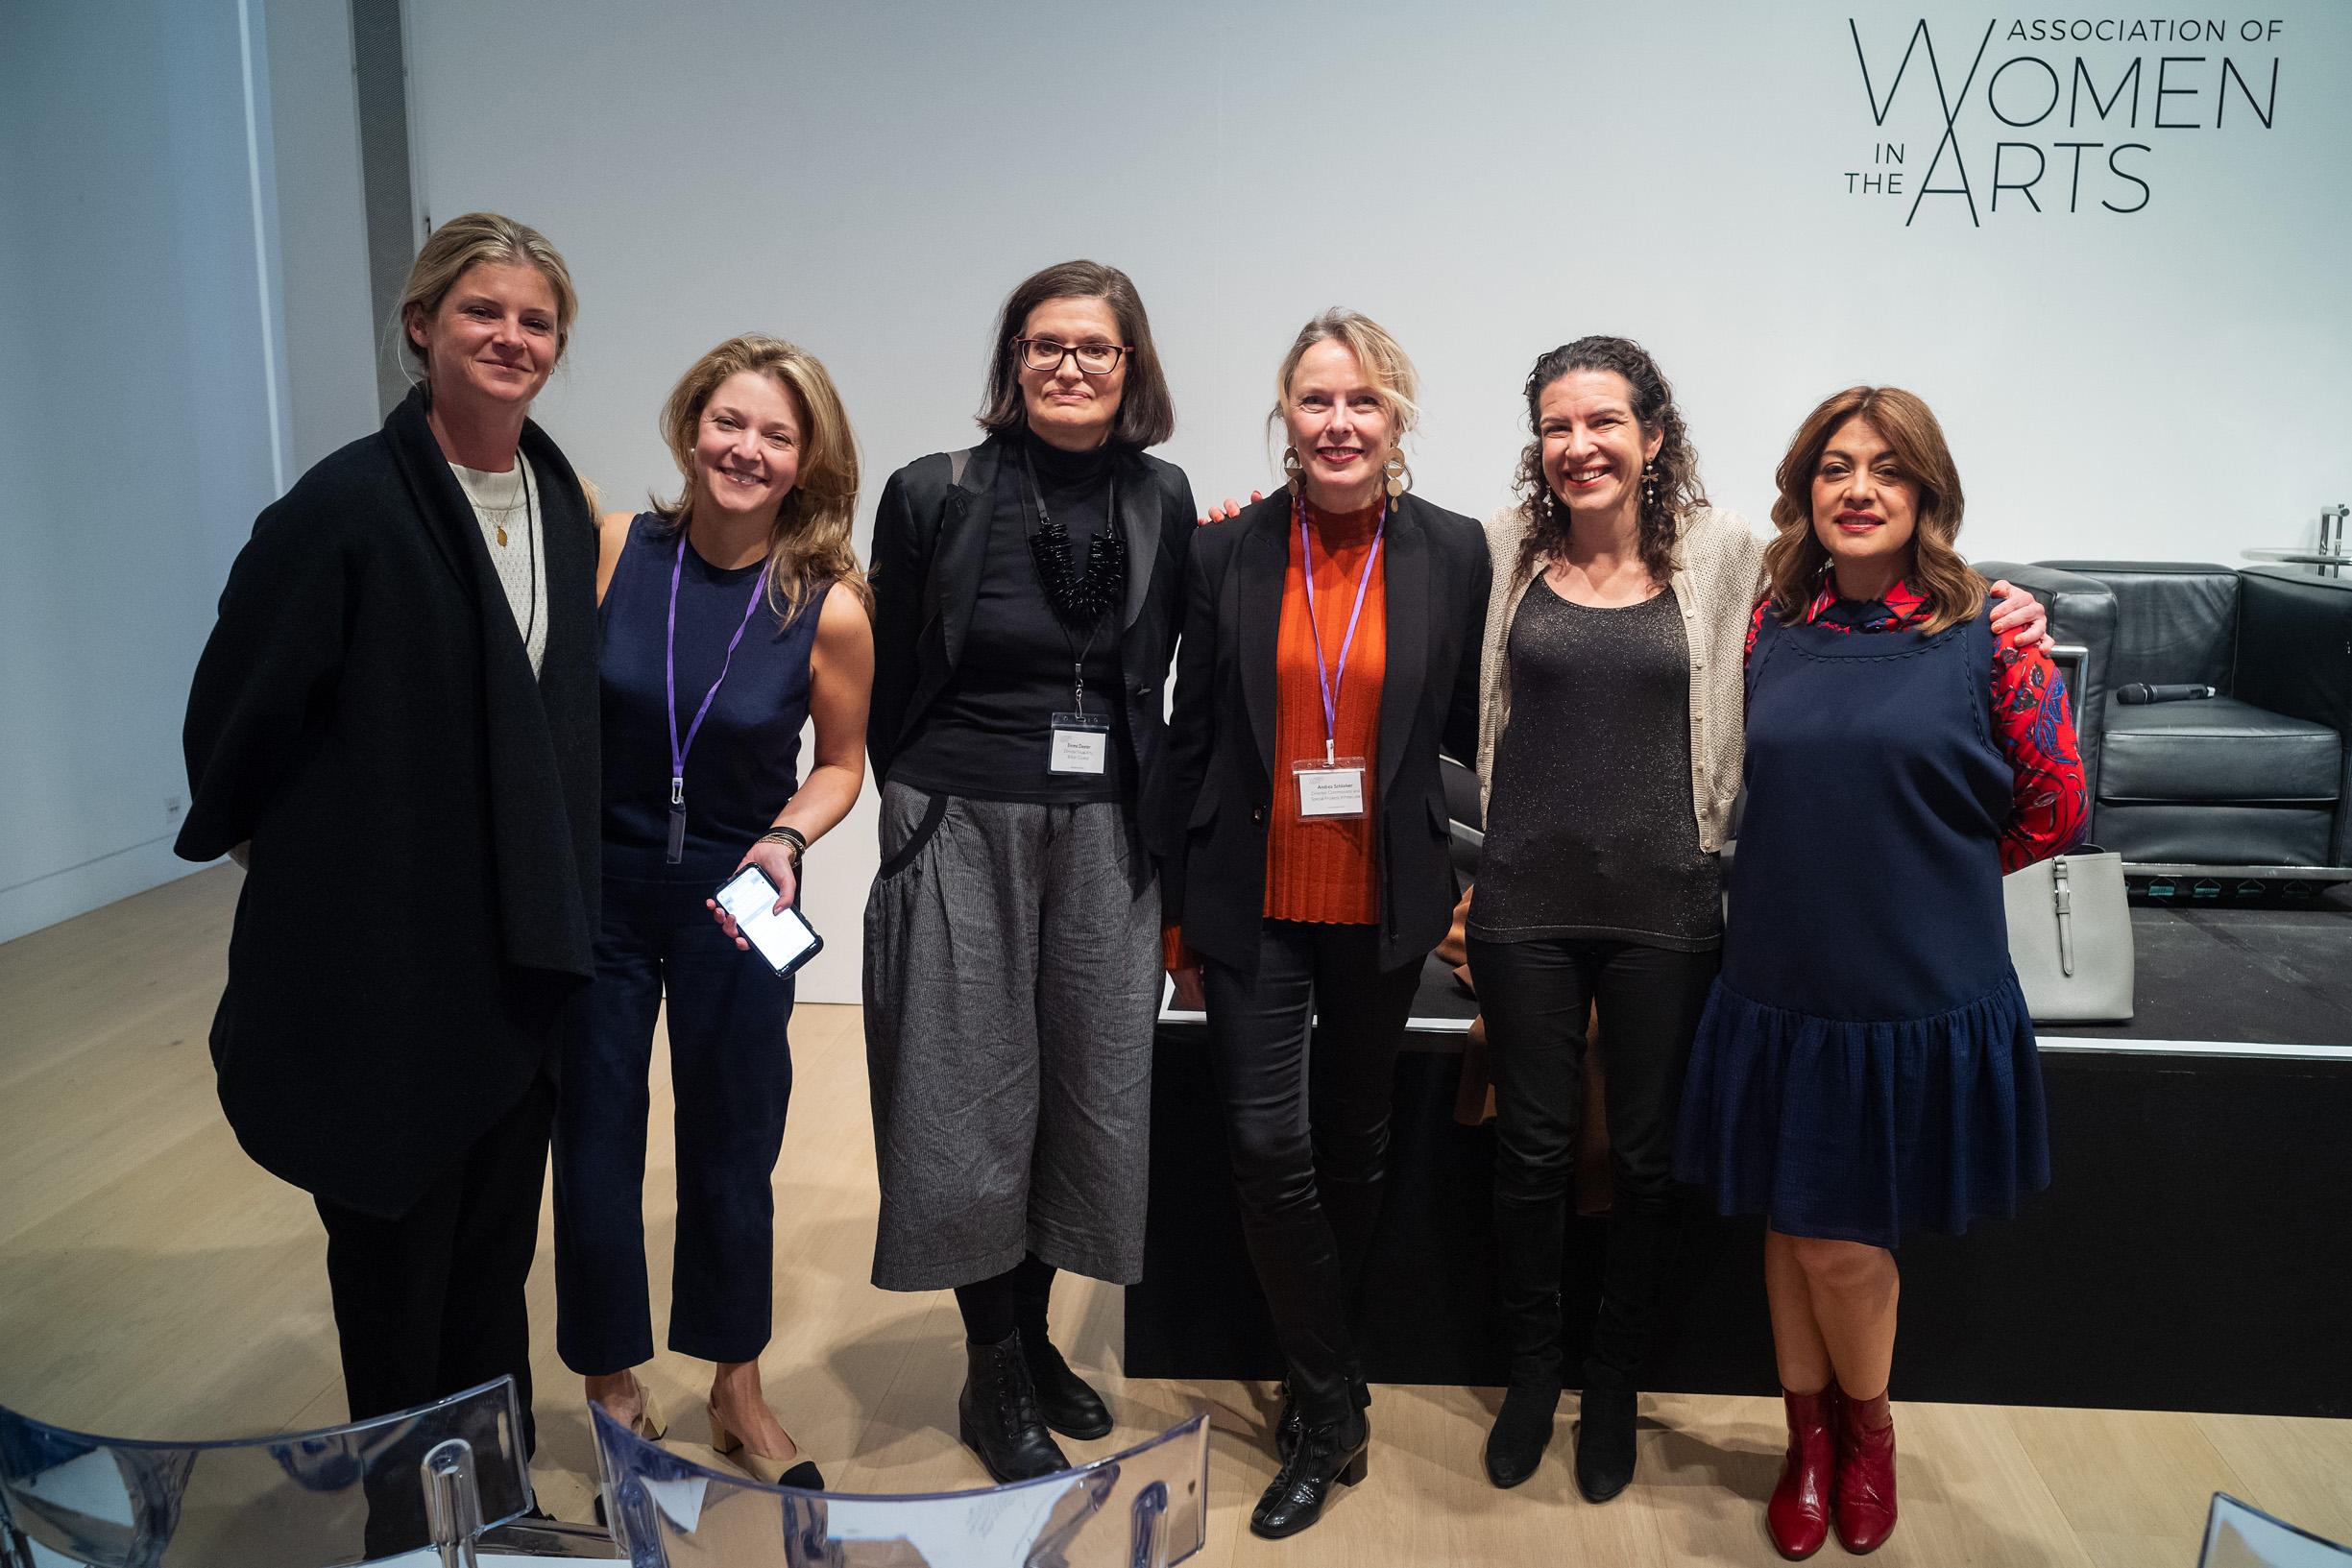 Aurore Ogden, Kate Gordon, Emma Dexter, Andrea Schlieker, Melanie Gerlis and Nazy Vassegh